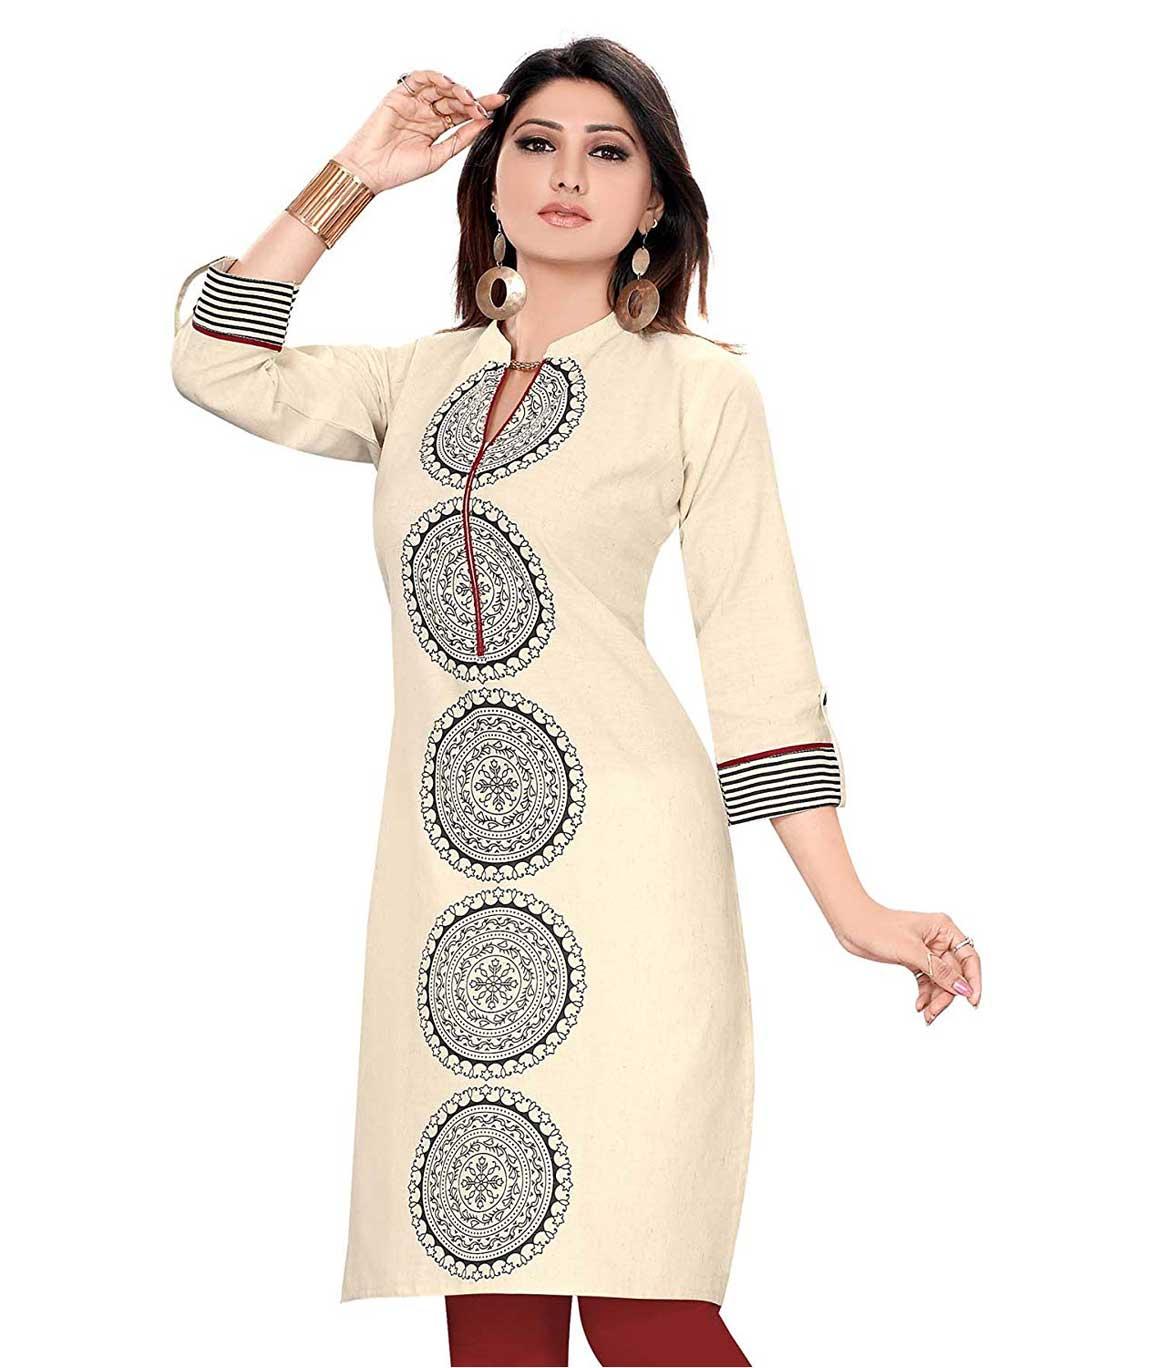 Plus Size Kurtis Handloom Cotton Cream Khadi Kurtis  1.0 out of 5 stars    1 customer review